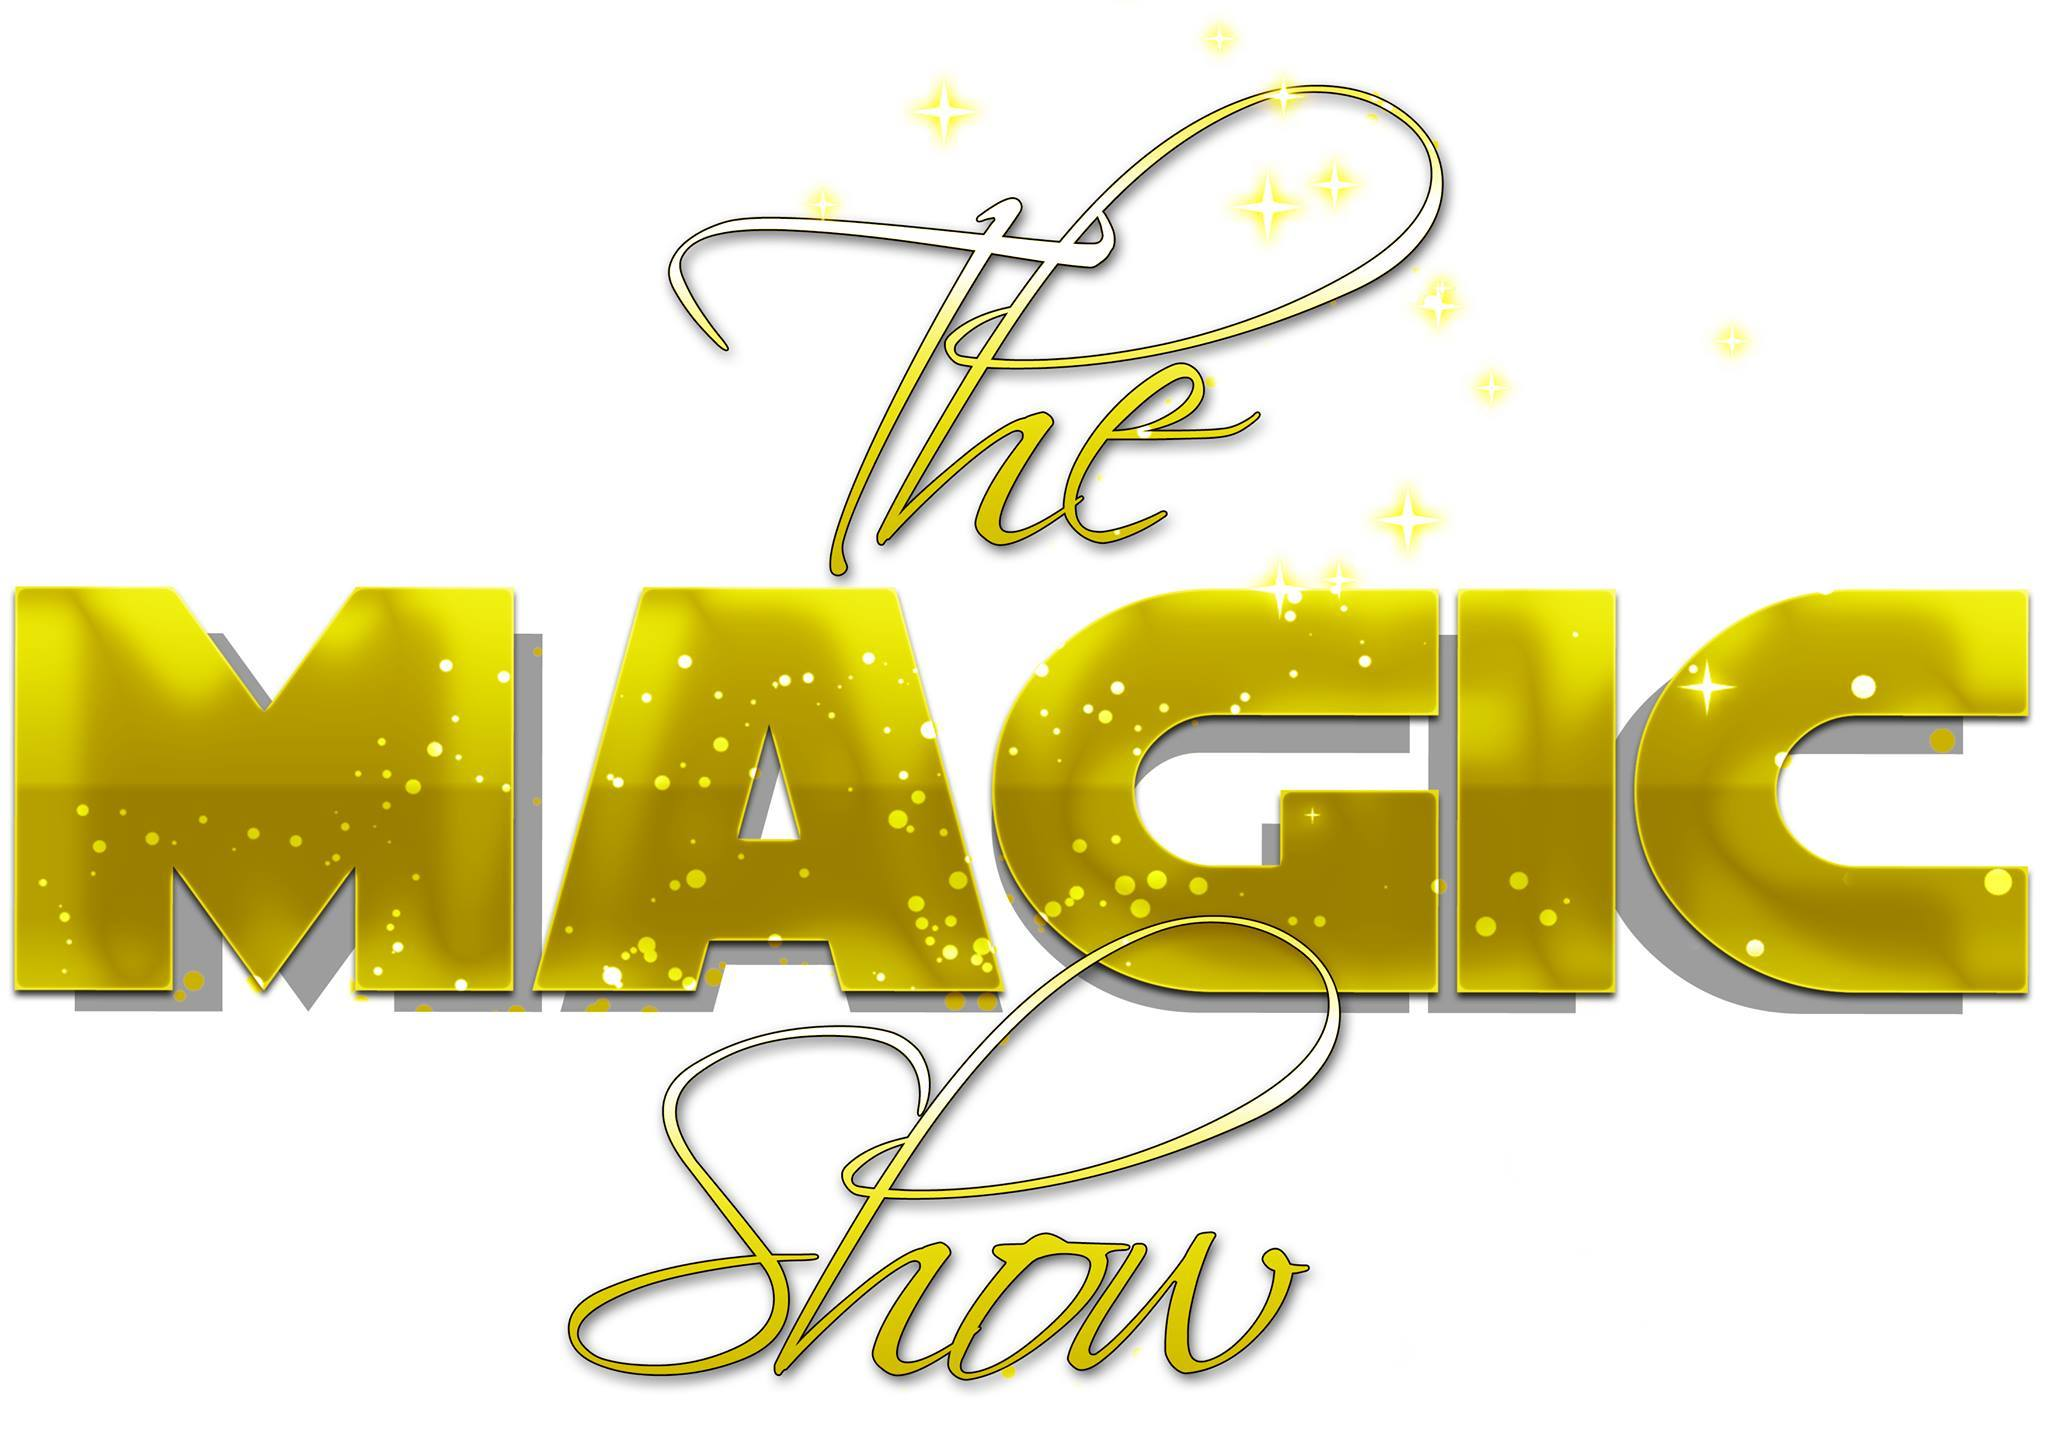 logo the magic show fond blanc